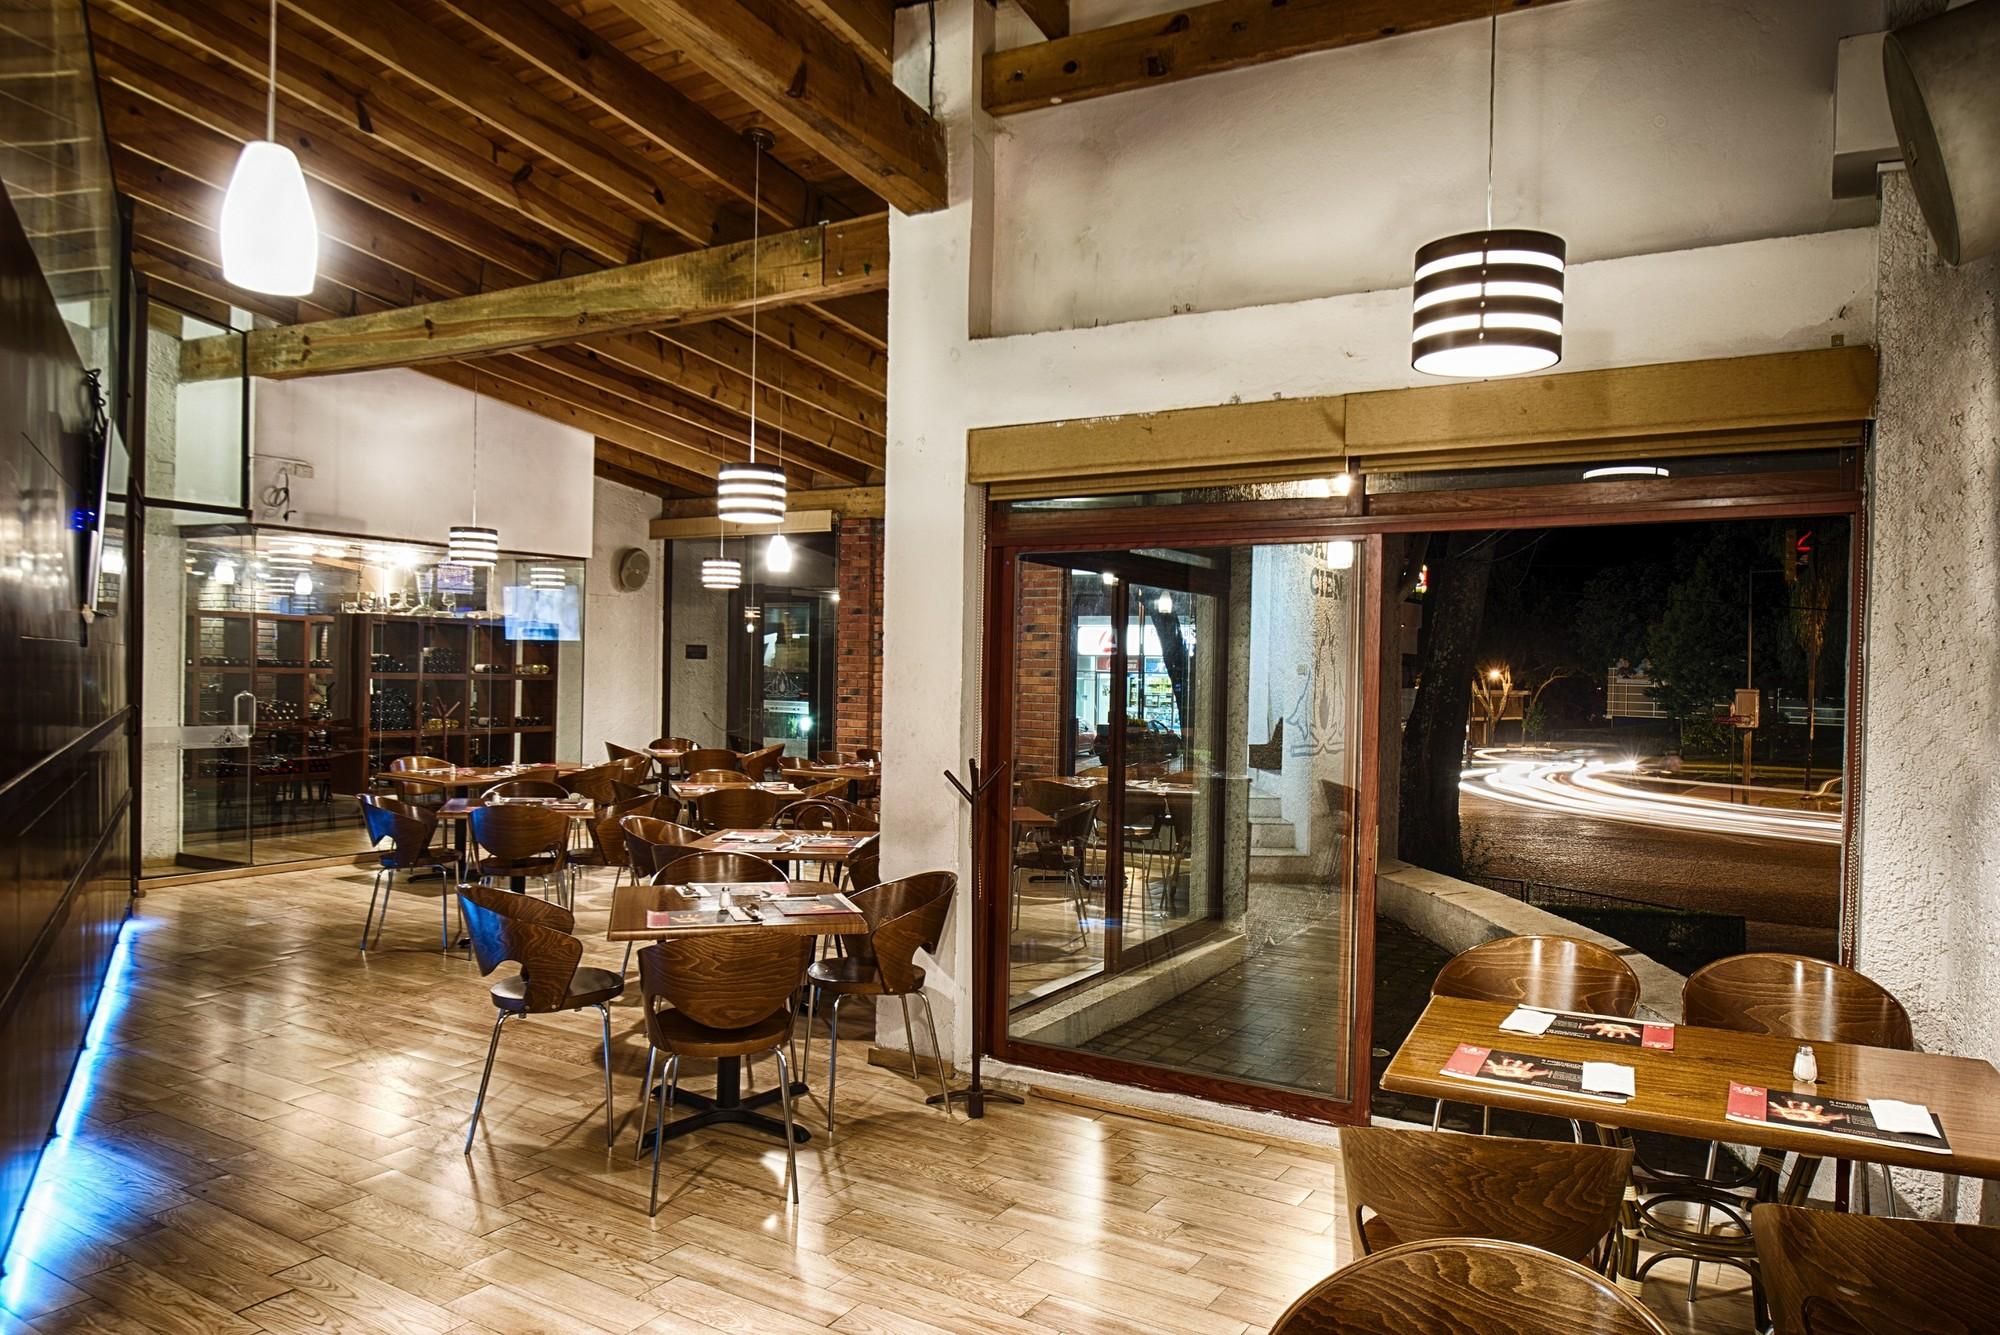 Restaurante asadero cien almanza studio plataforma for Restaurante arquitectura